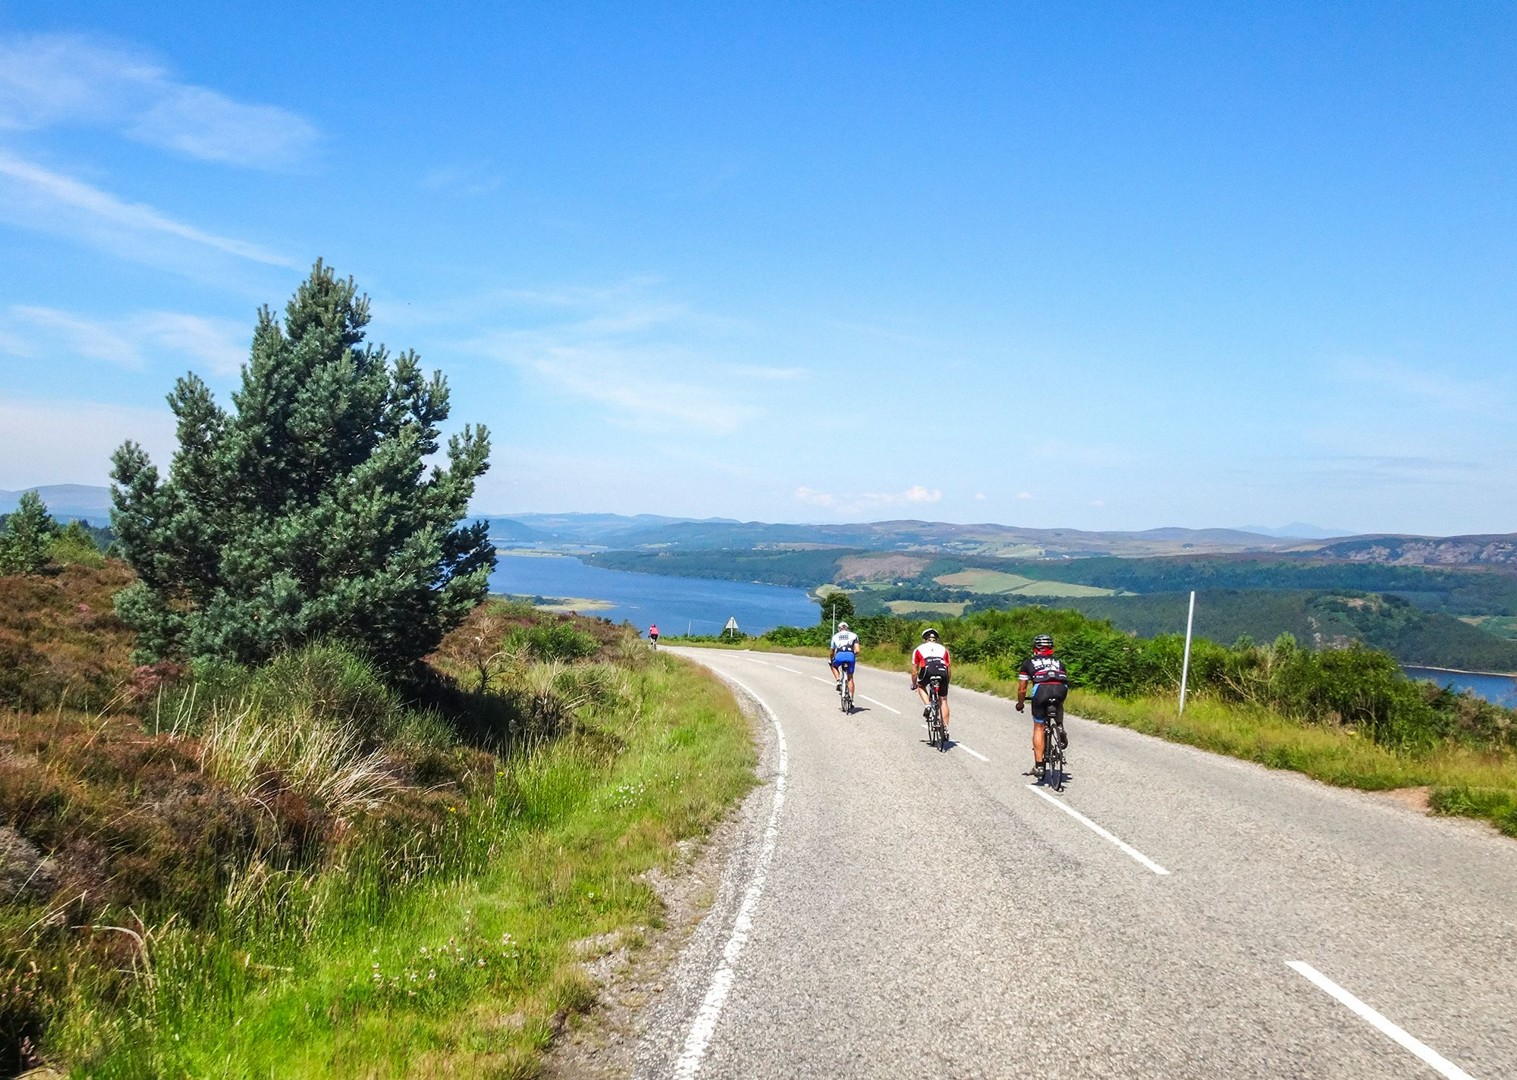 uk-lands-end-to-john-ogroats-explorer-trip-guided-cycling-holiday.jpg - UK - Land's End to John O'Groats Explorer (22 days) - Guided Cycling Holiday - Road Cycling